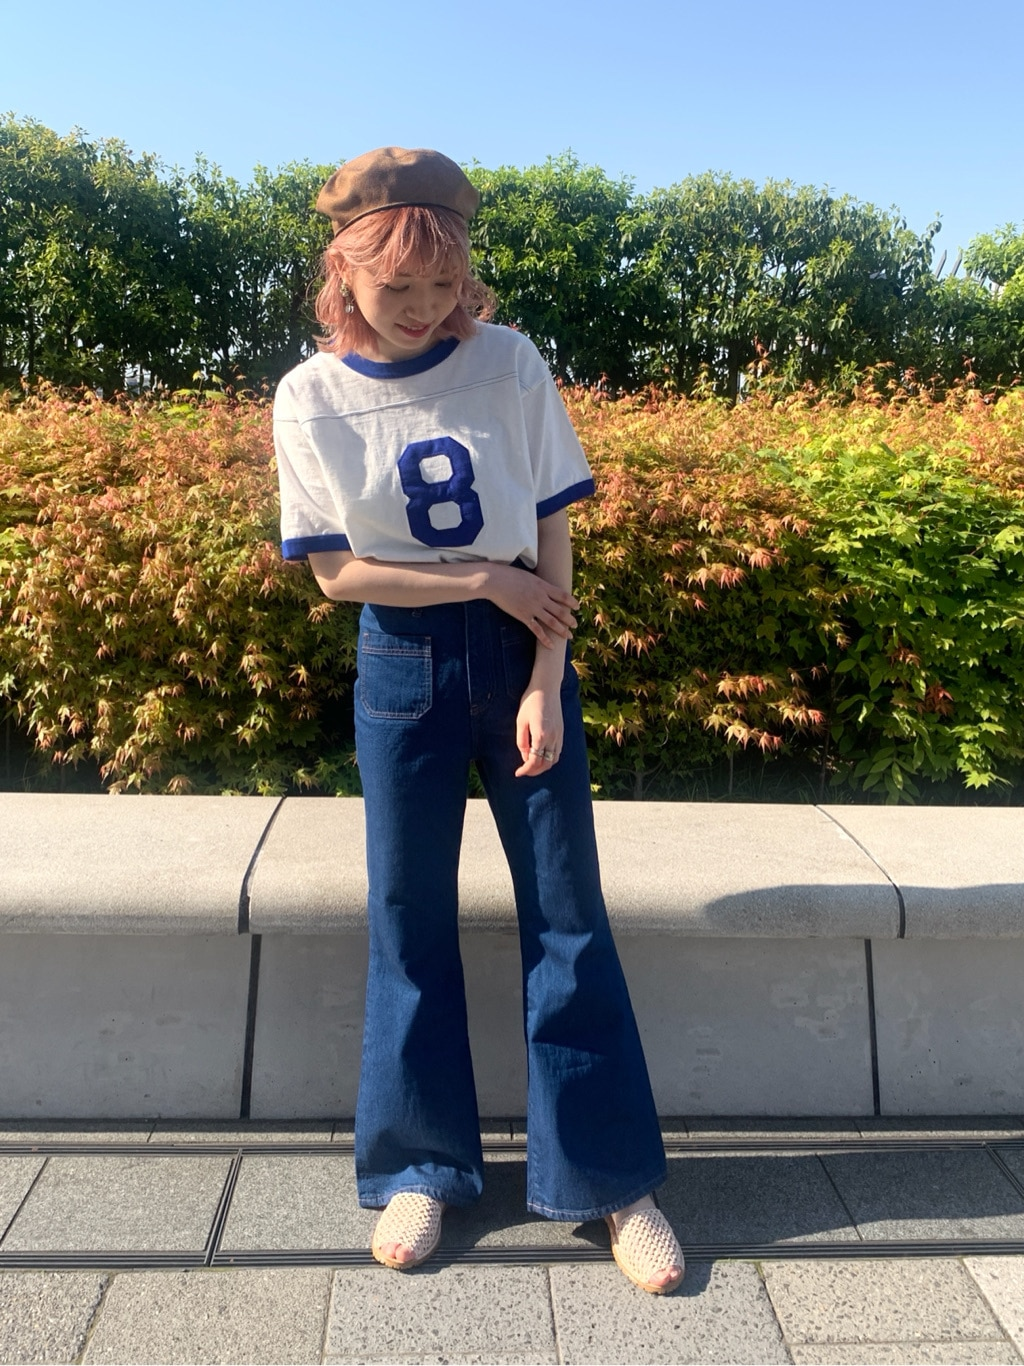 CHILD WOMAN , PAR ICI 東京スカイツリータウン・ソラマチ 2021.05.12